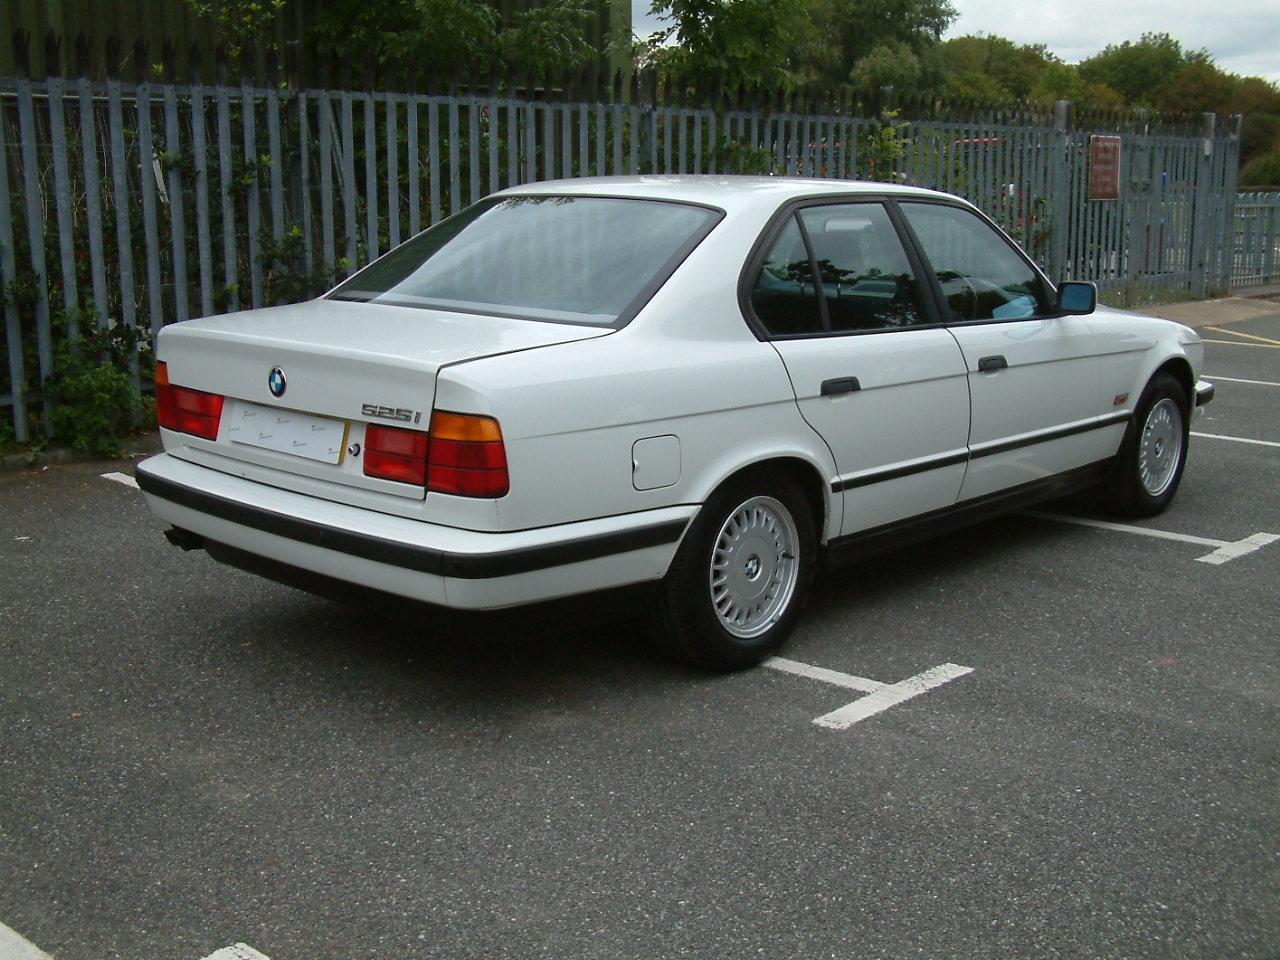 Classic 1994 BMW E34 525i Auto 65000 miles For Sale (picture 3 of 6)